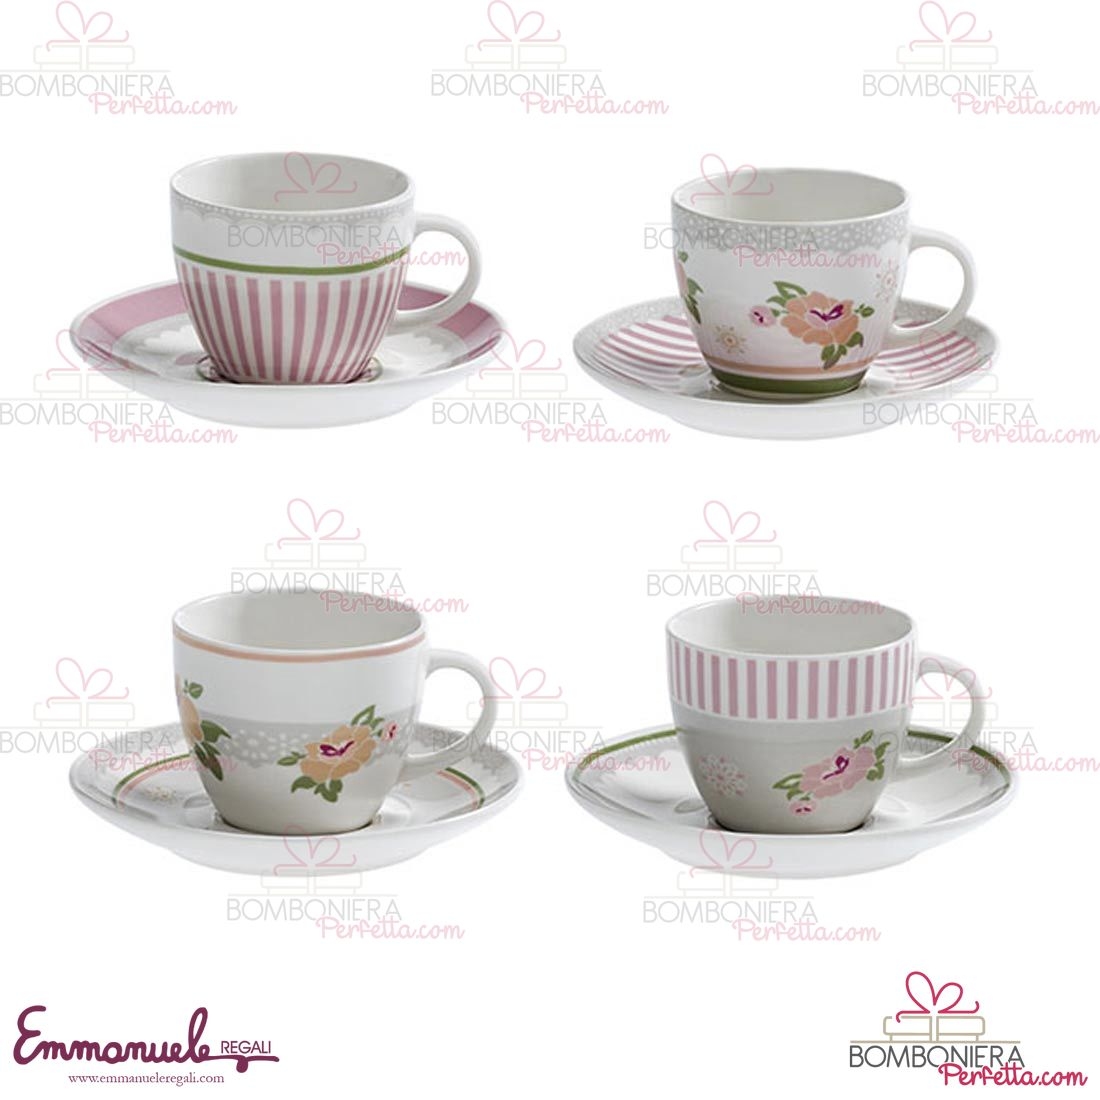 53250_tazzina_caffè_set_4_pezzi_brandani_2019_emmanueleregali_bombonieraperfetta.jpg (1100×1100)